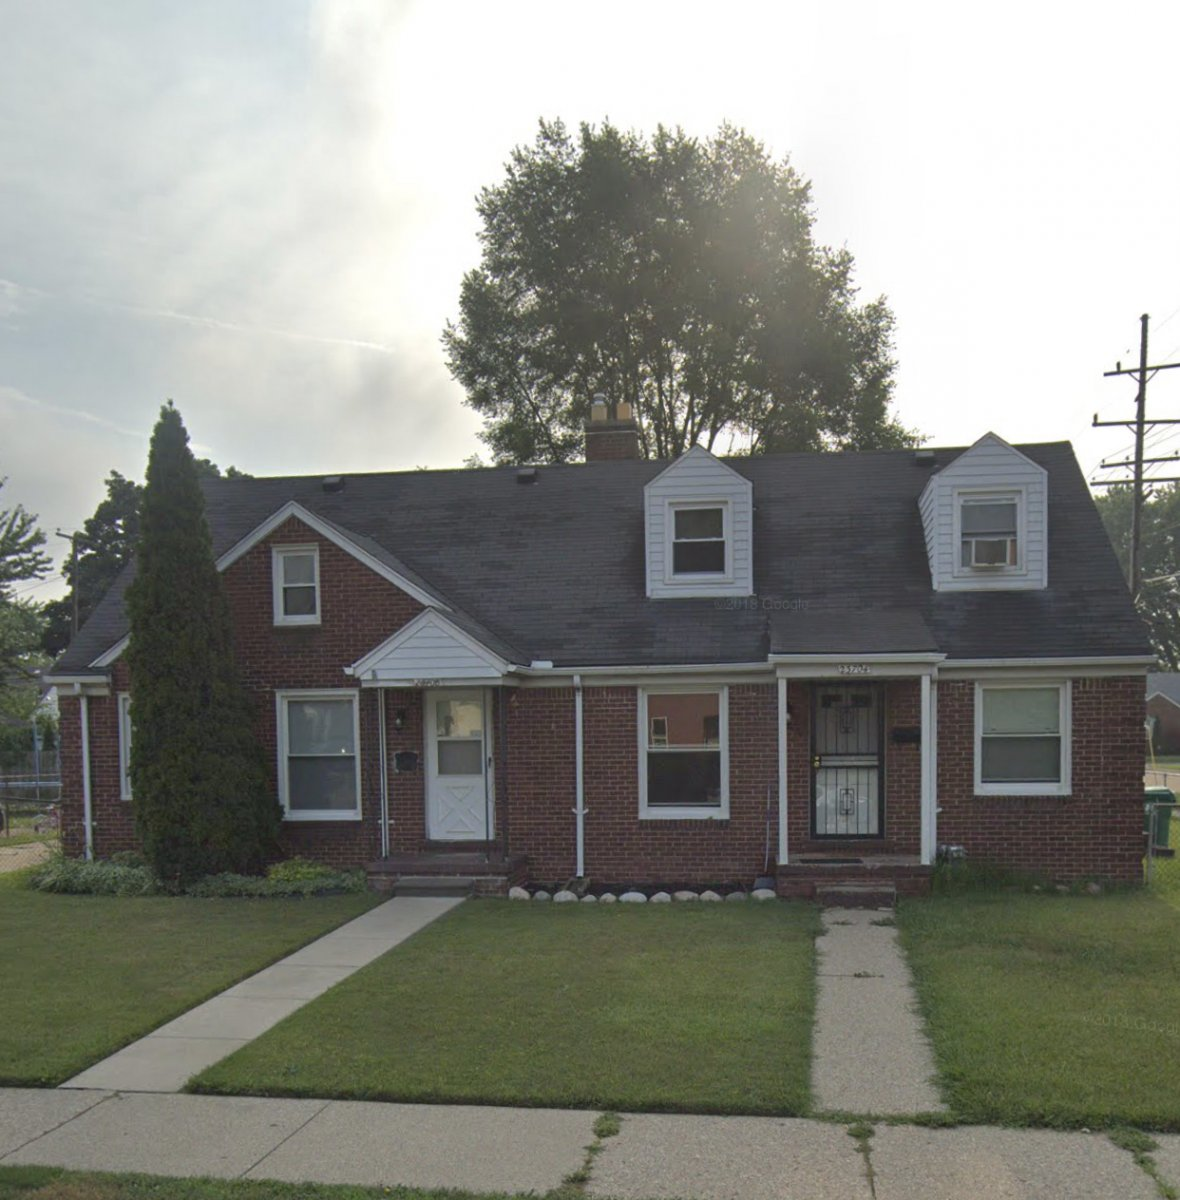 Duplex for sale in eastpointe michigan